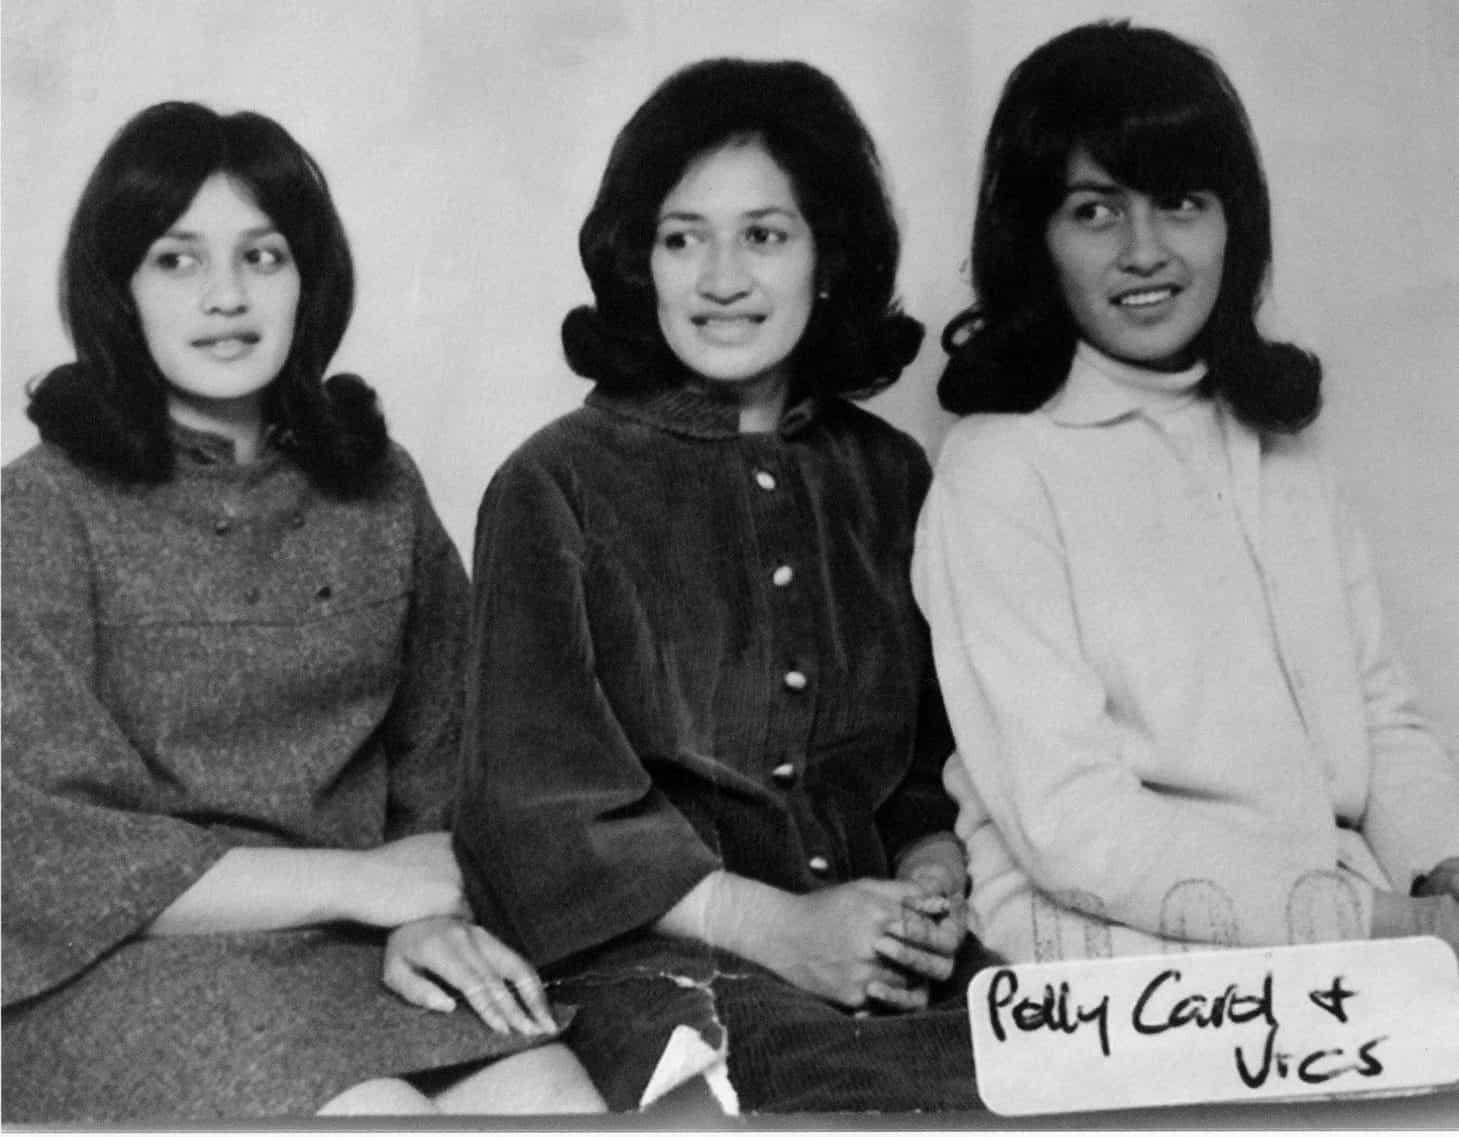 Witi Ihimaera's sisters